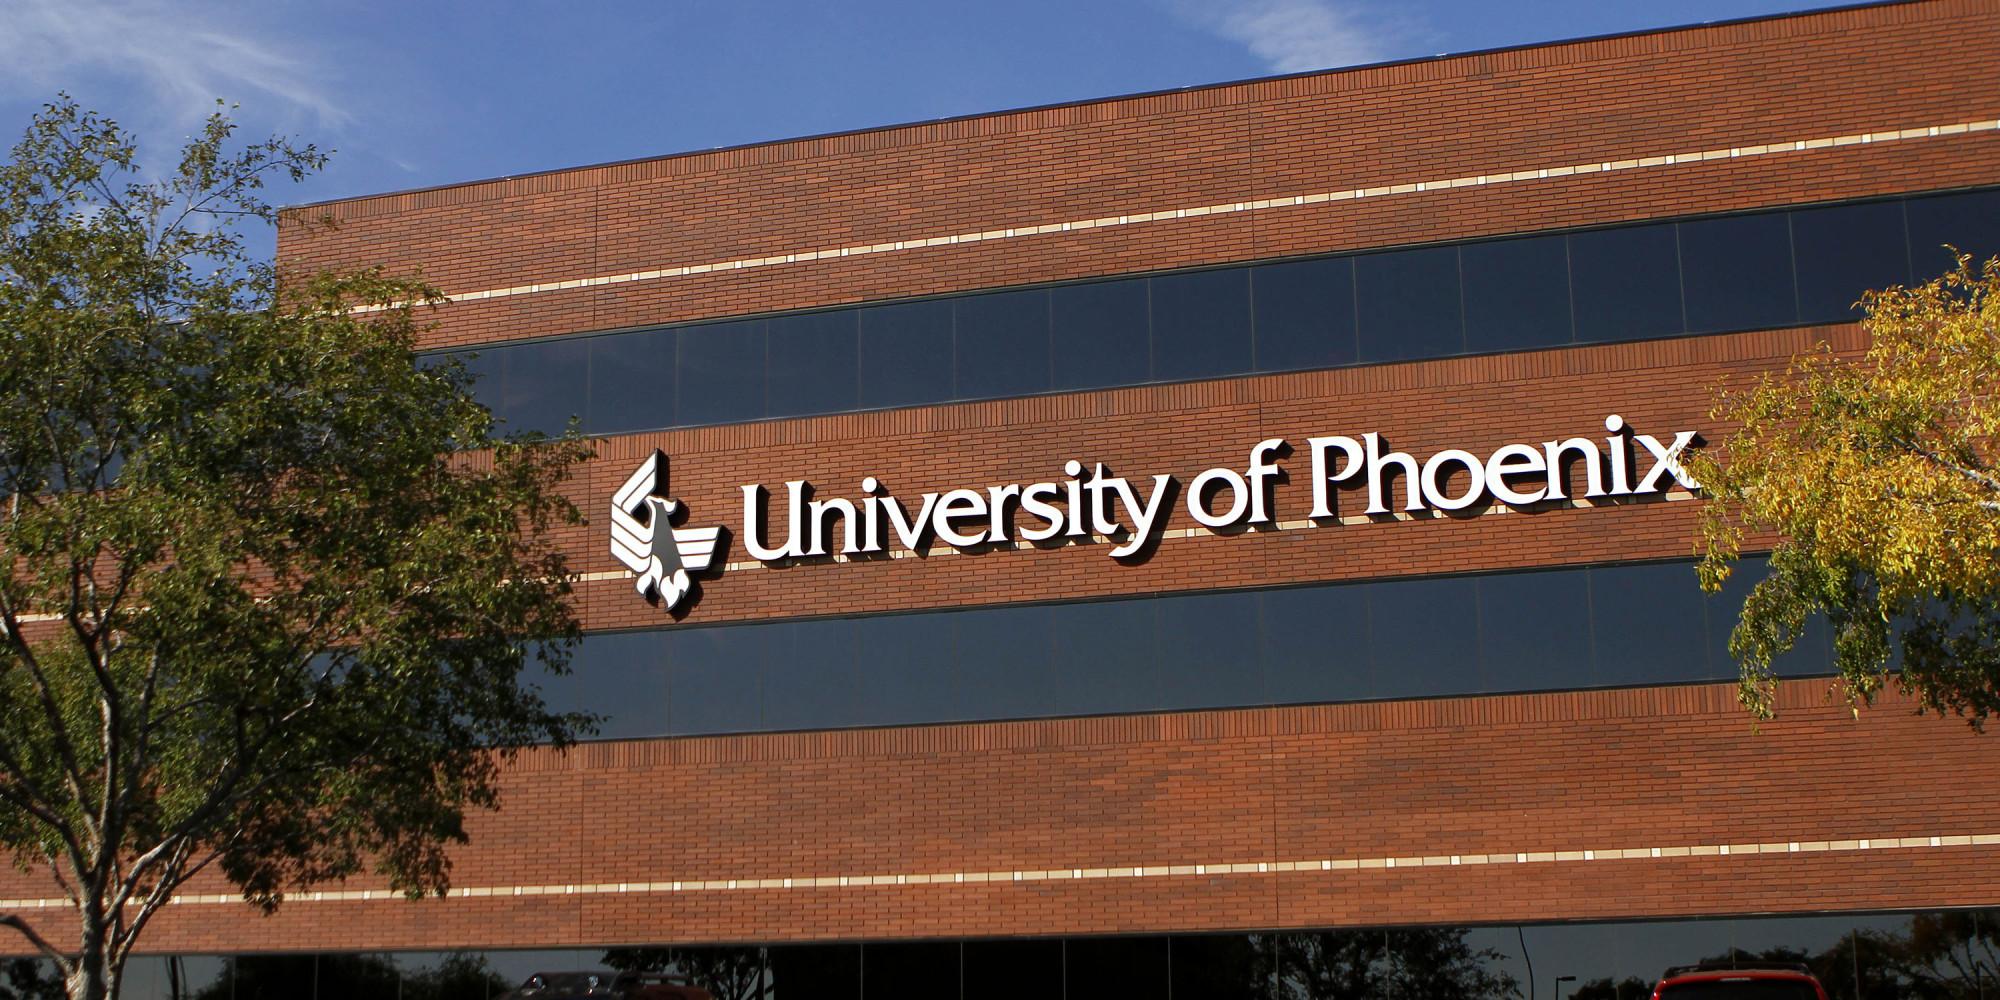 new york post slam of university of phoenix deal suggests